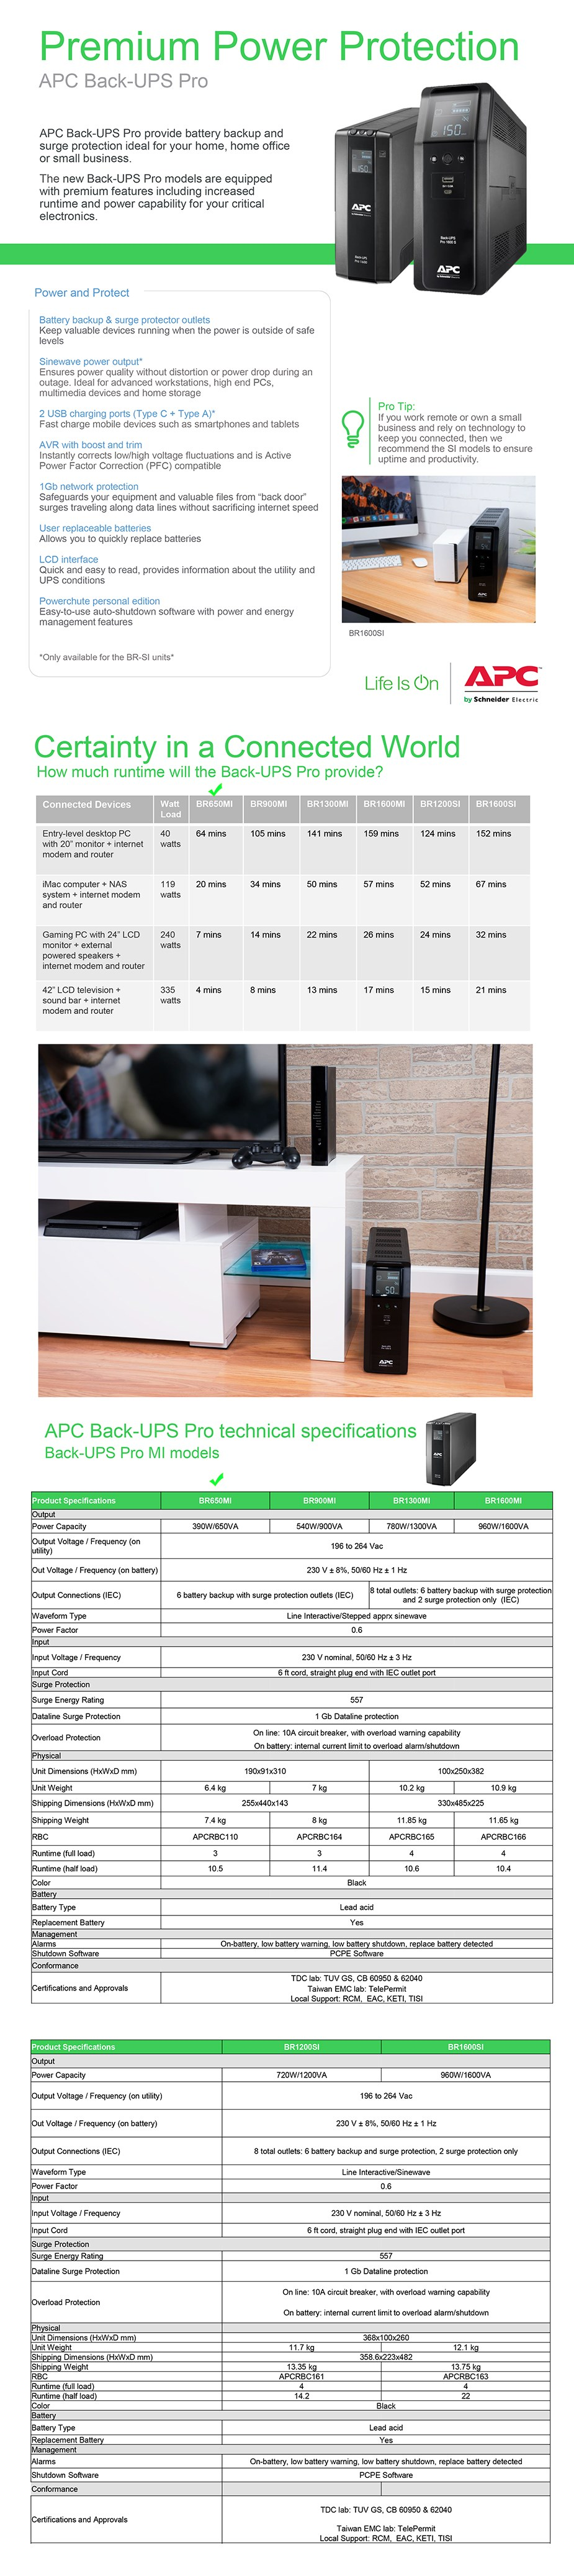 apc-br650mi-back-ups-pro-br-650va390w-line-interactive-ups-ac33518-6.jpg